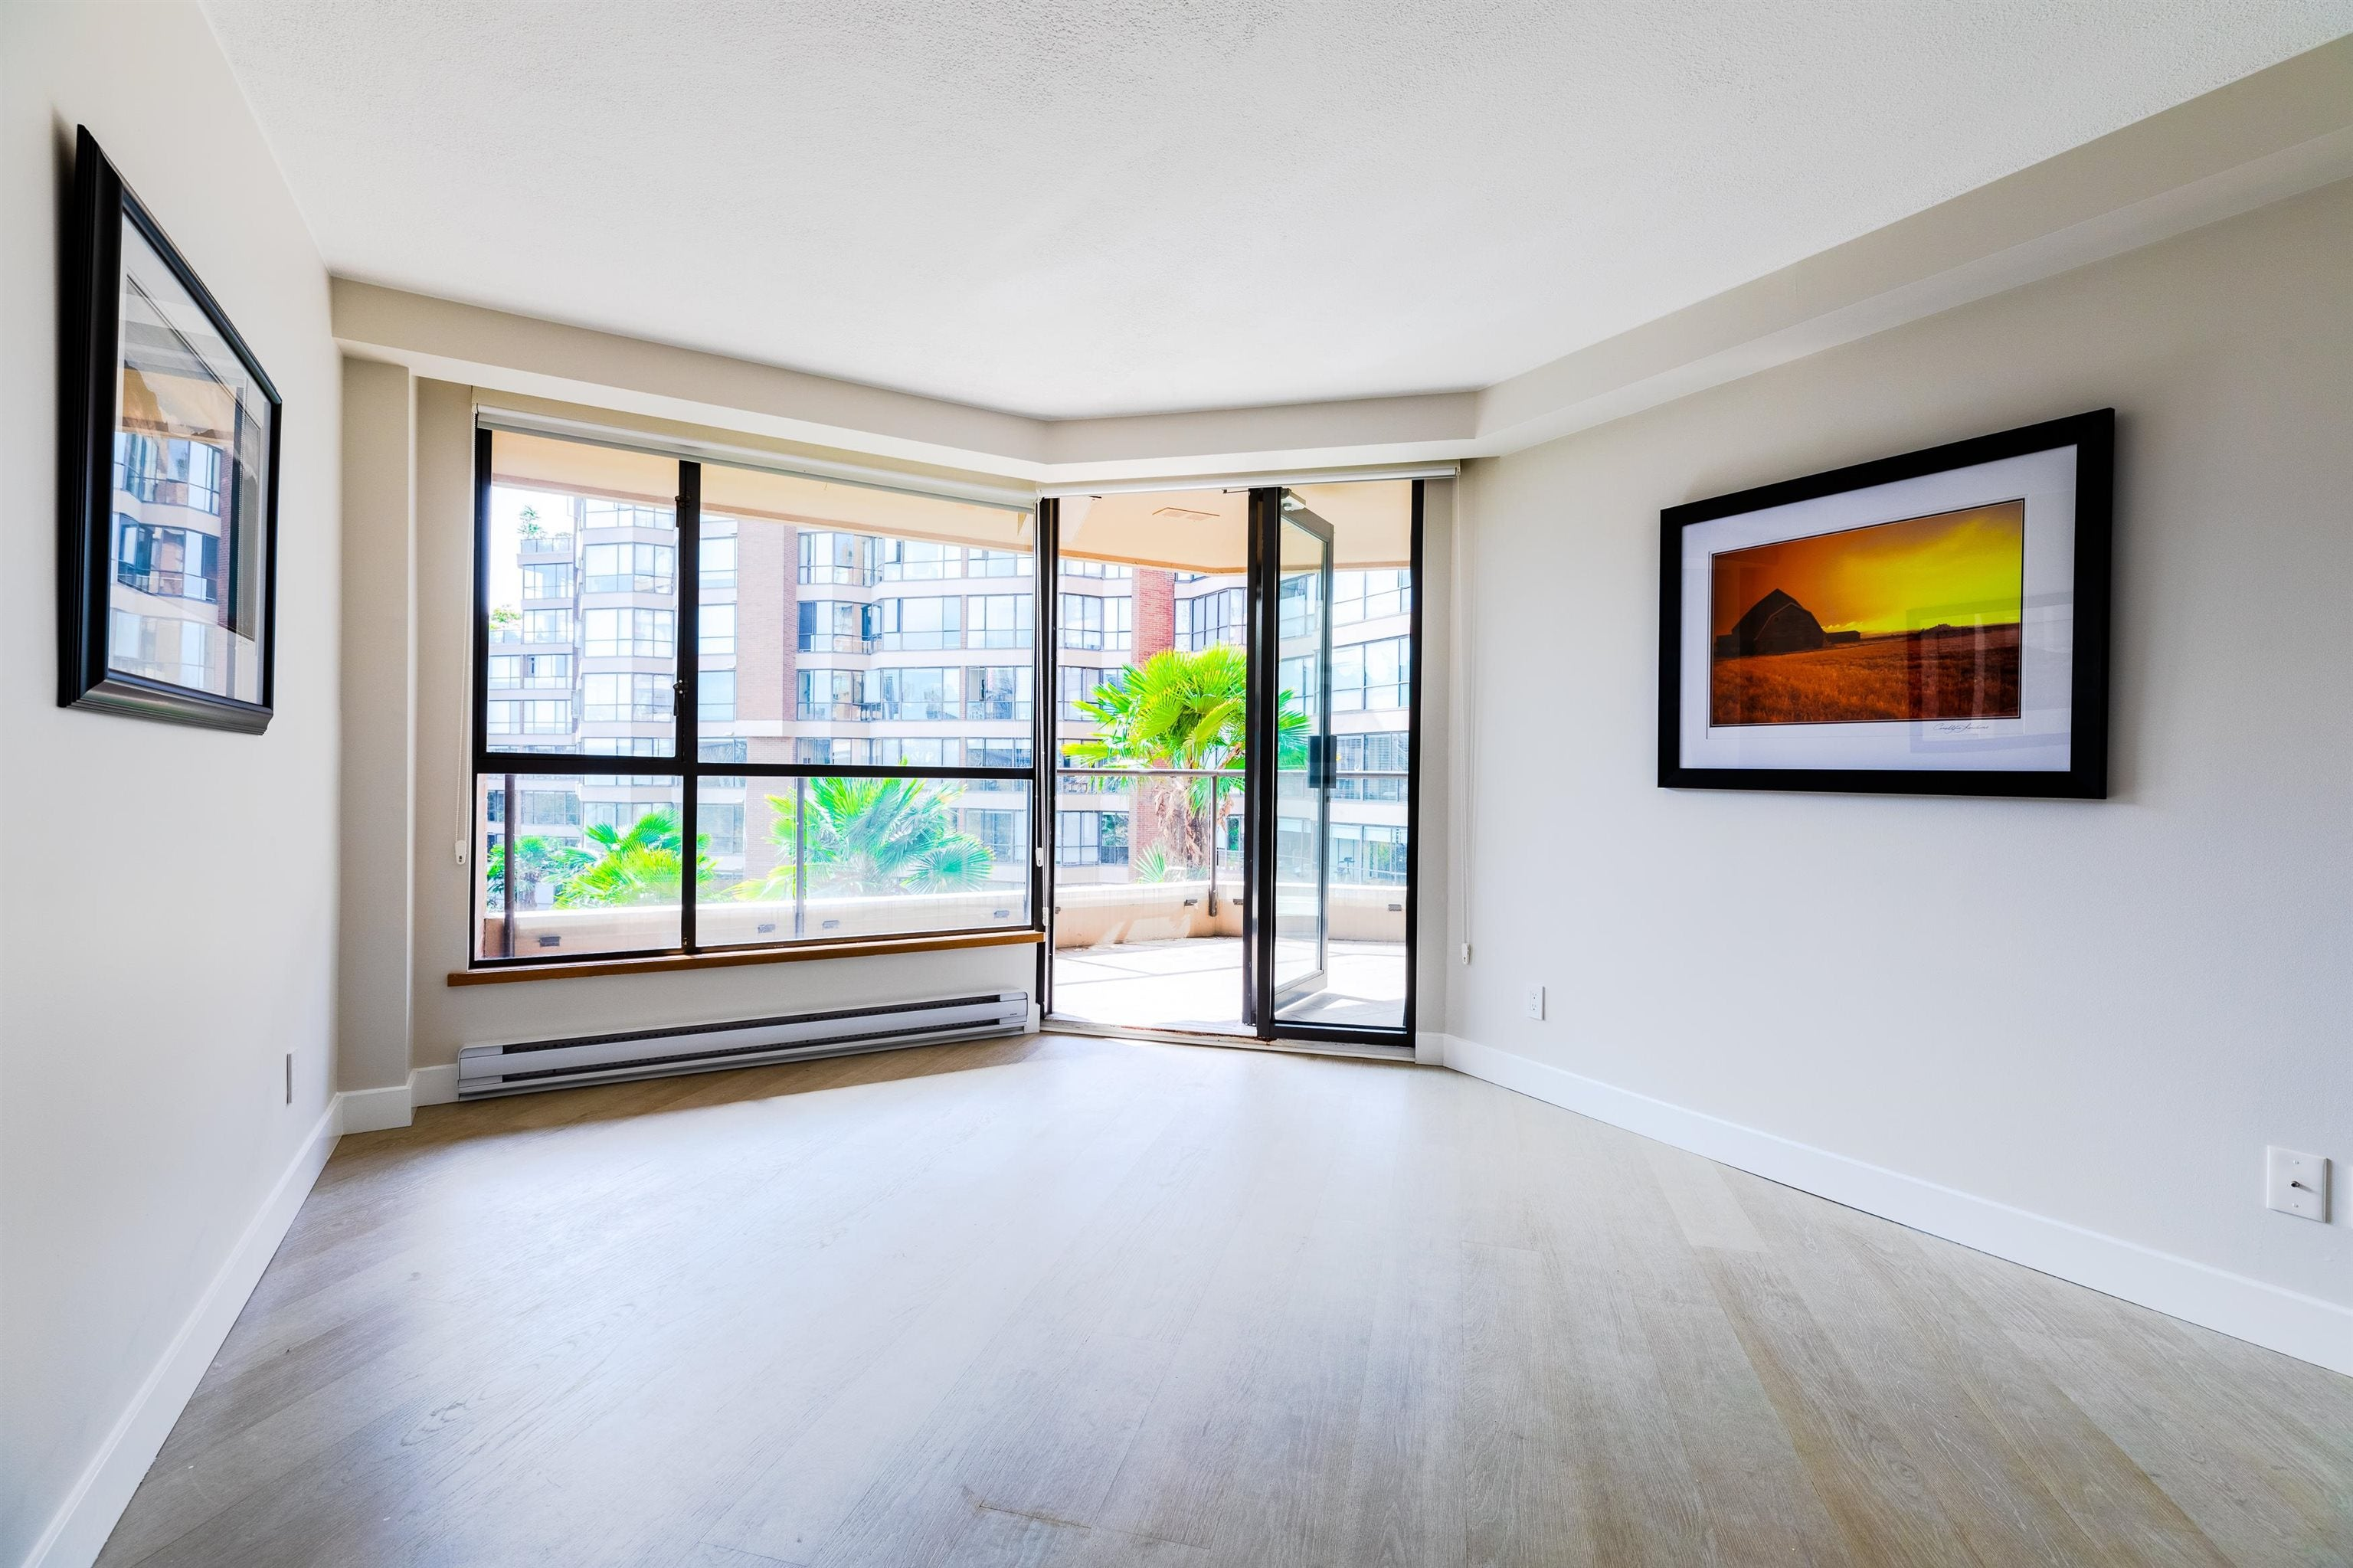 406 1450 PENNYFARTHING DRIVE - False Creek Apartment/Condo for sale, 2 Bedrooms (R2617259) - #22